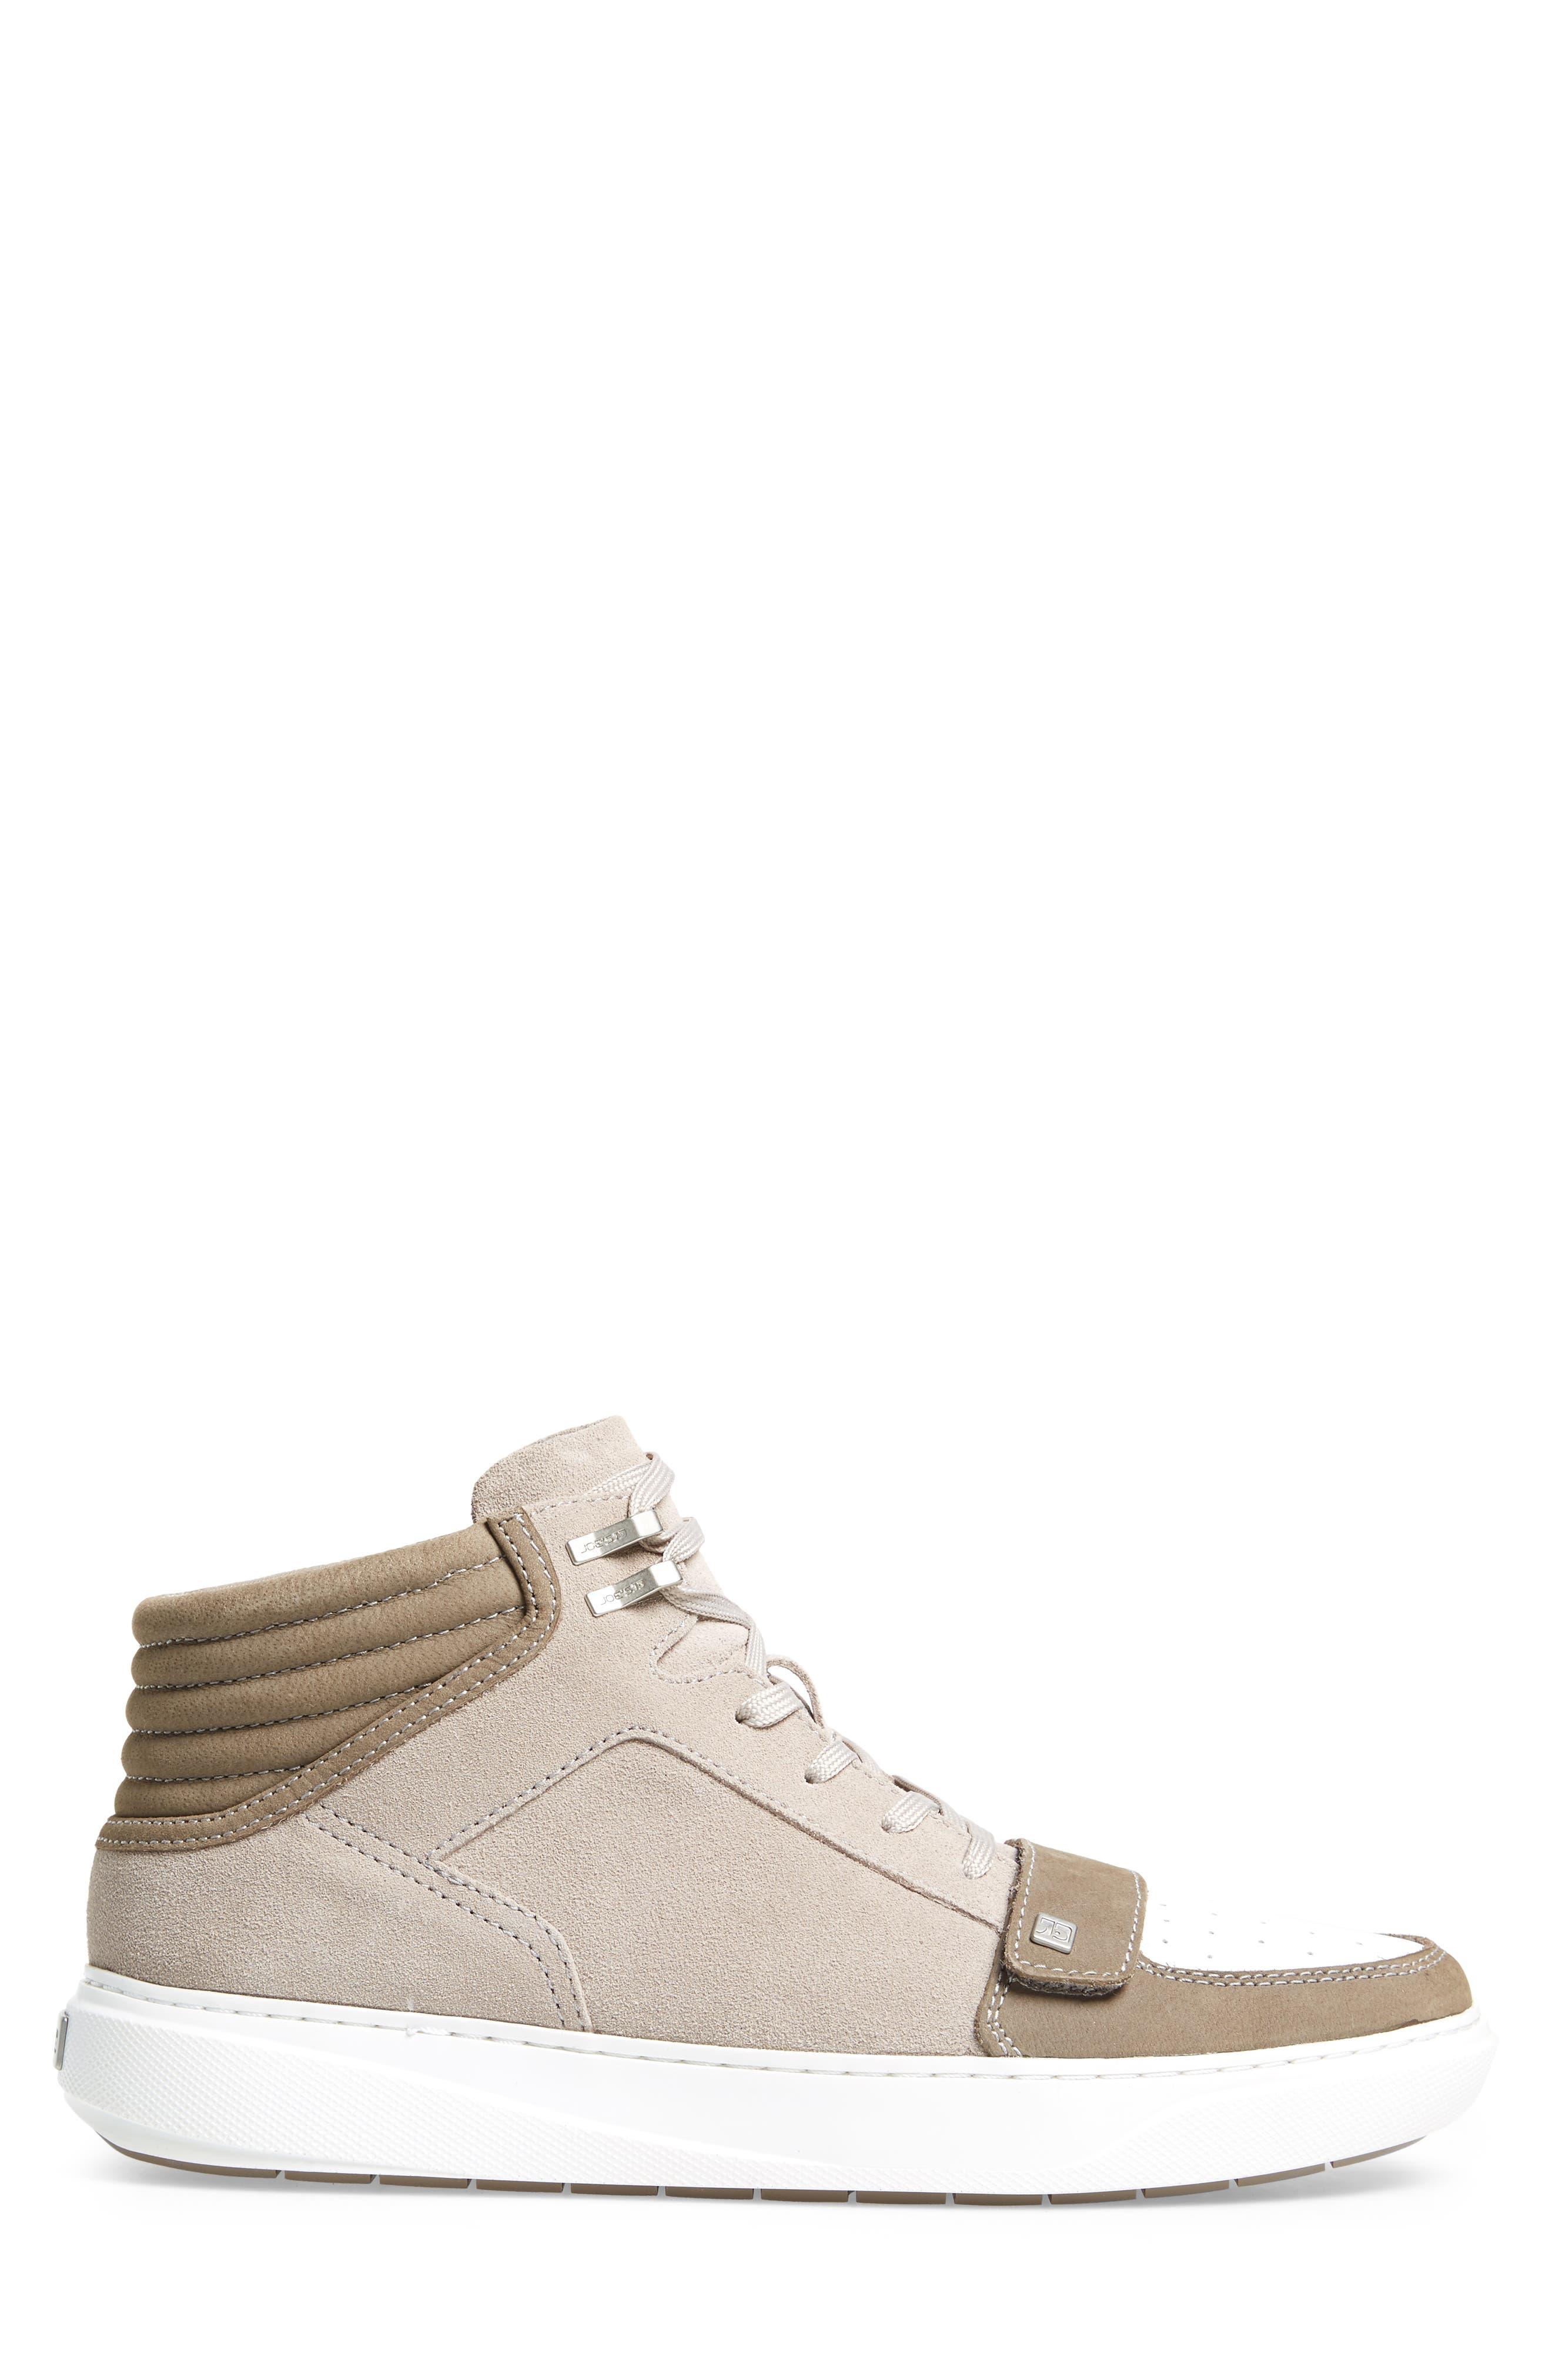 Alternate Image 3  - Joe's Joe L Mid Top Sneaker (Men)